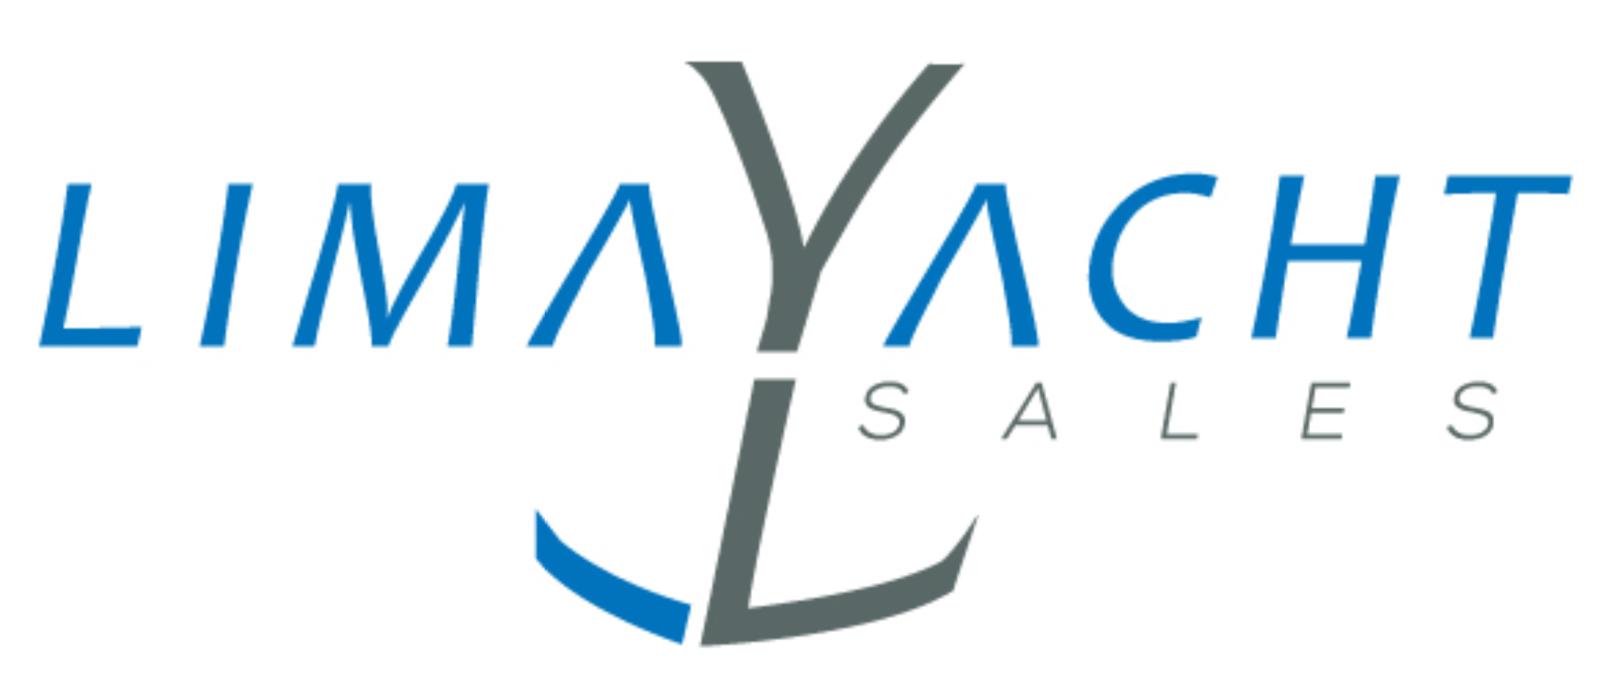 lima-yachtsales.com logo